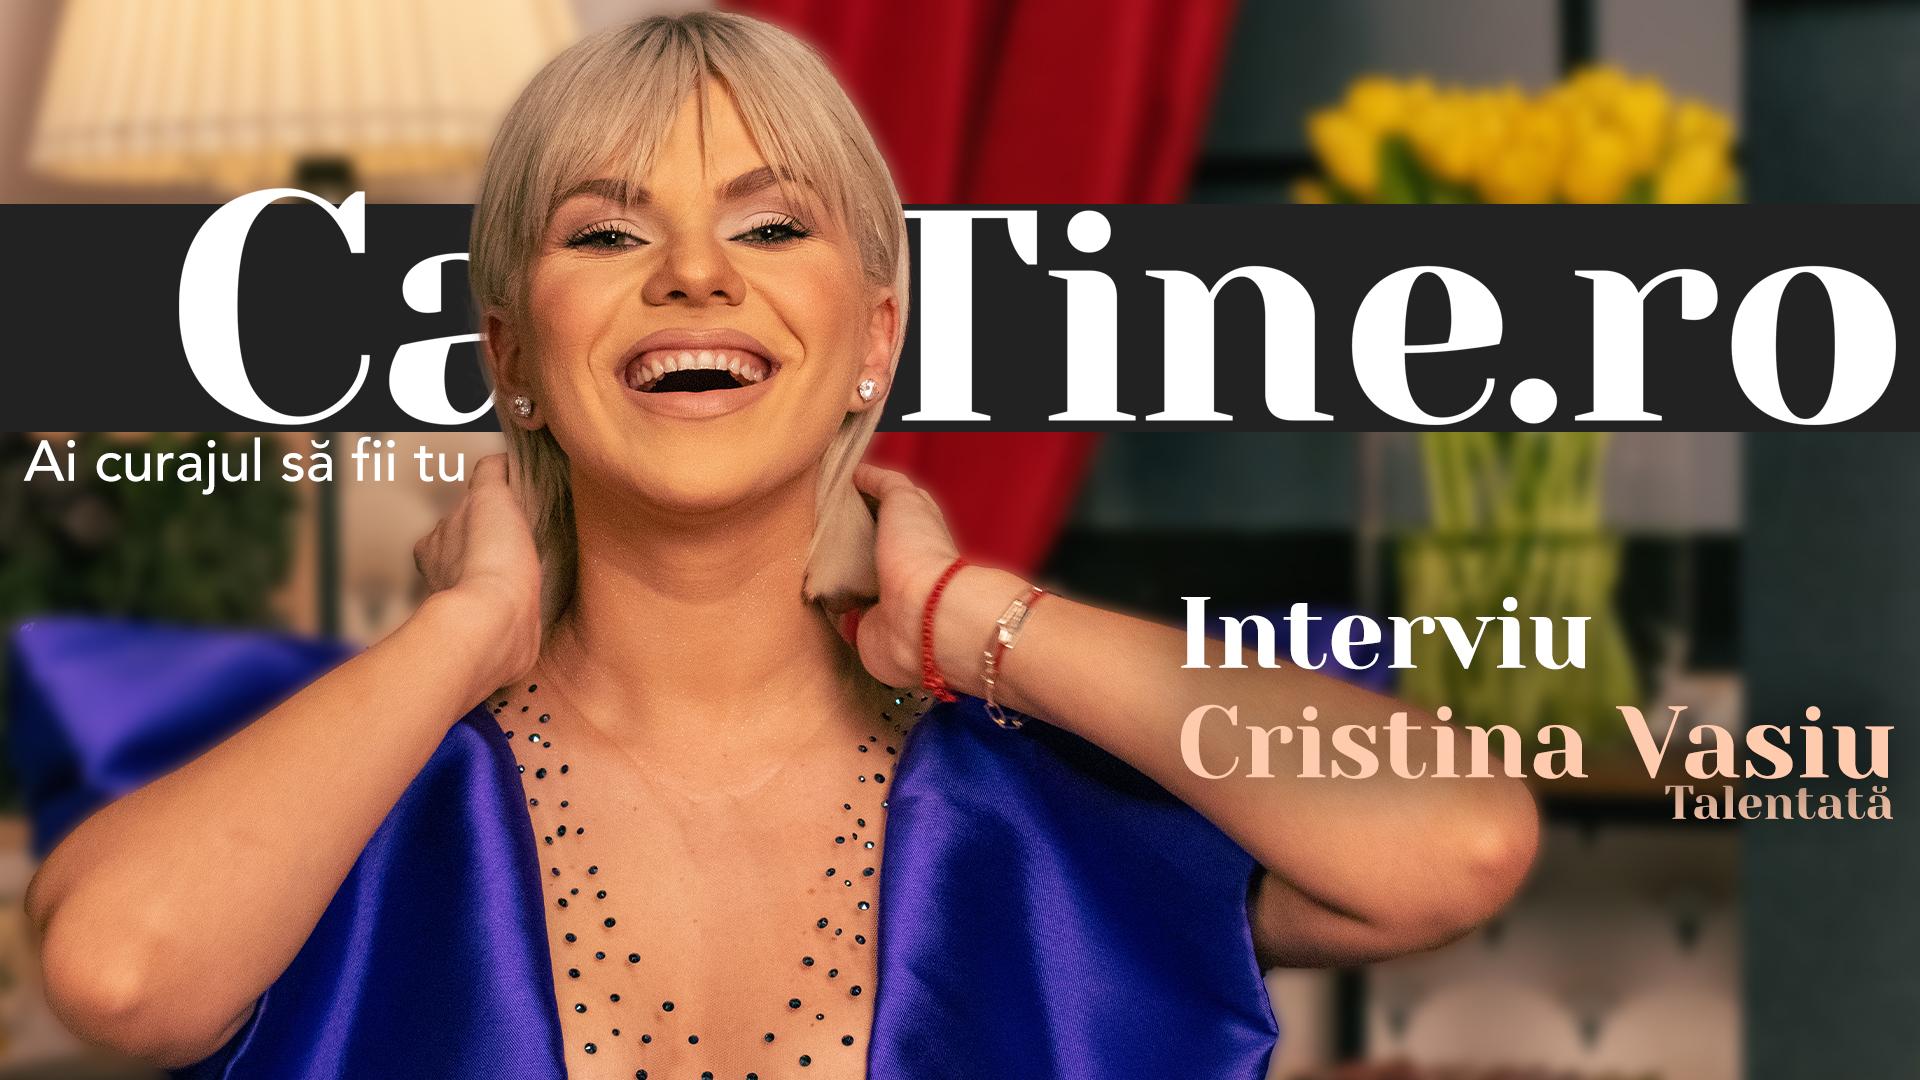 CaTine.Ro - Interviu Cristina Vasiu - Talentată